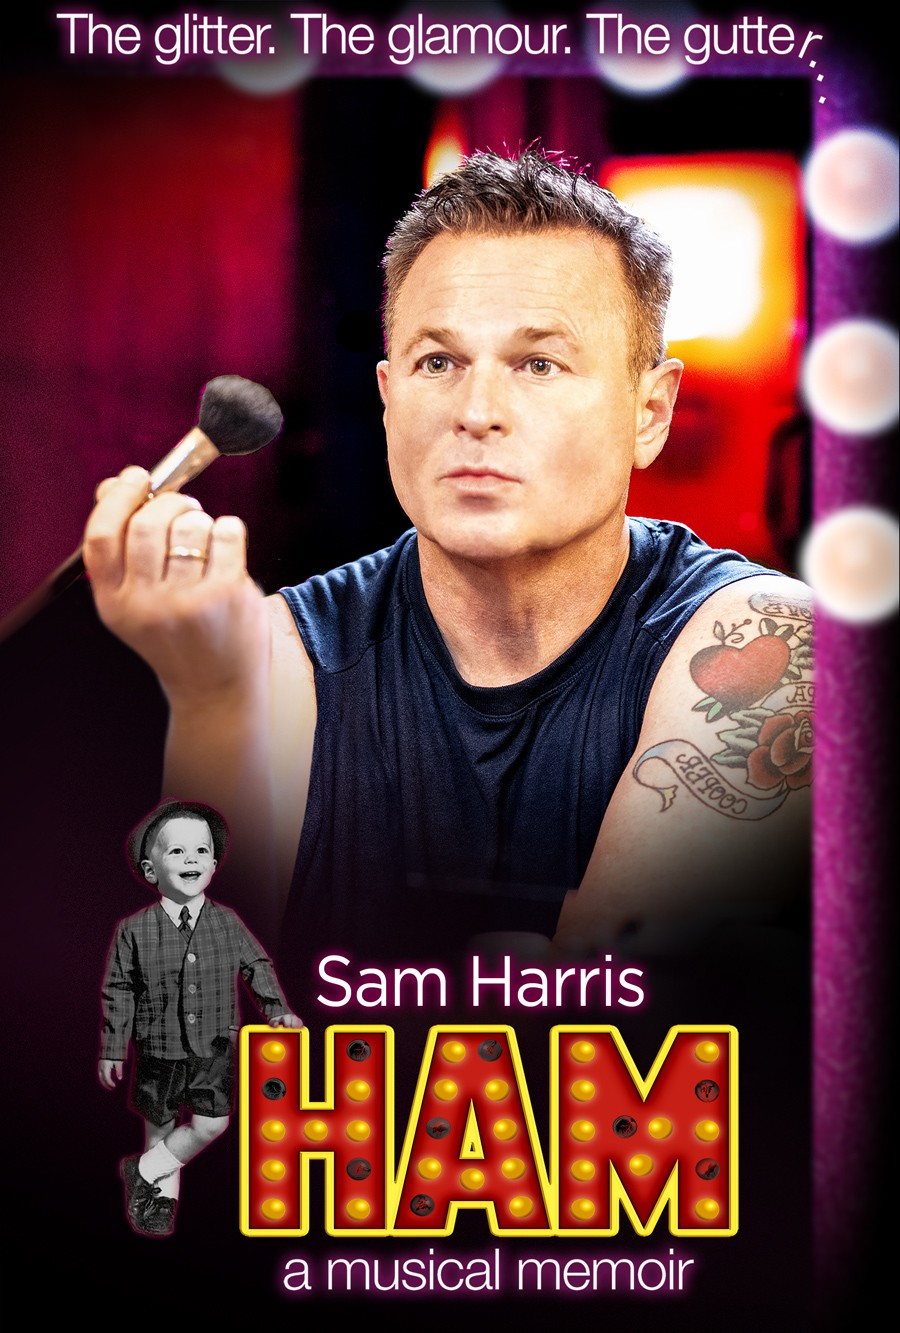 Ham_2x3_poster